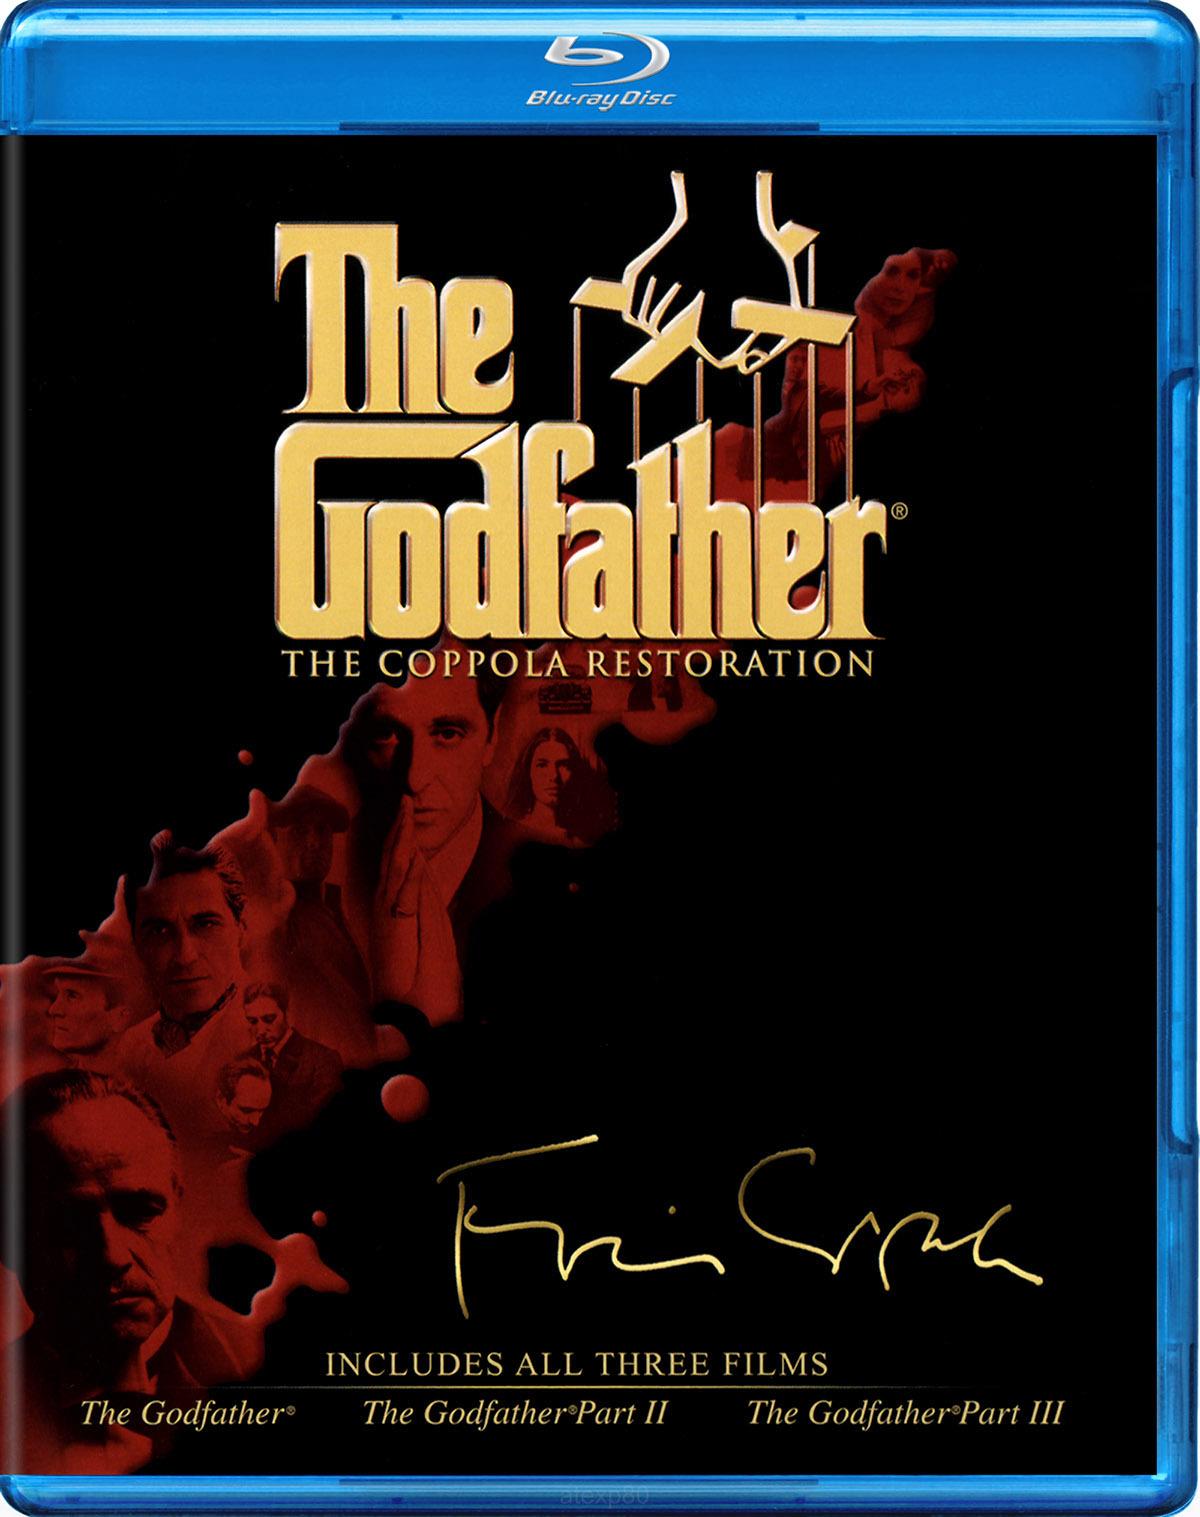 The Godfather (1972) Hindi PGS Subtitle - Hindi PGS Subtitle